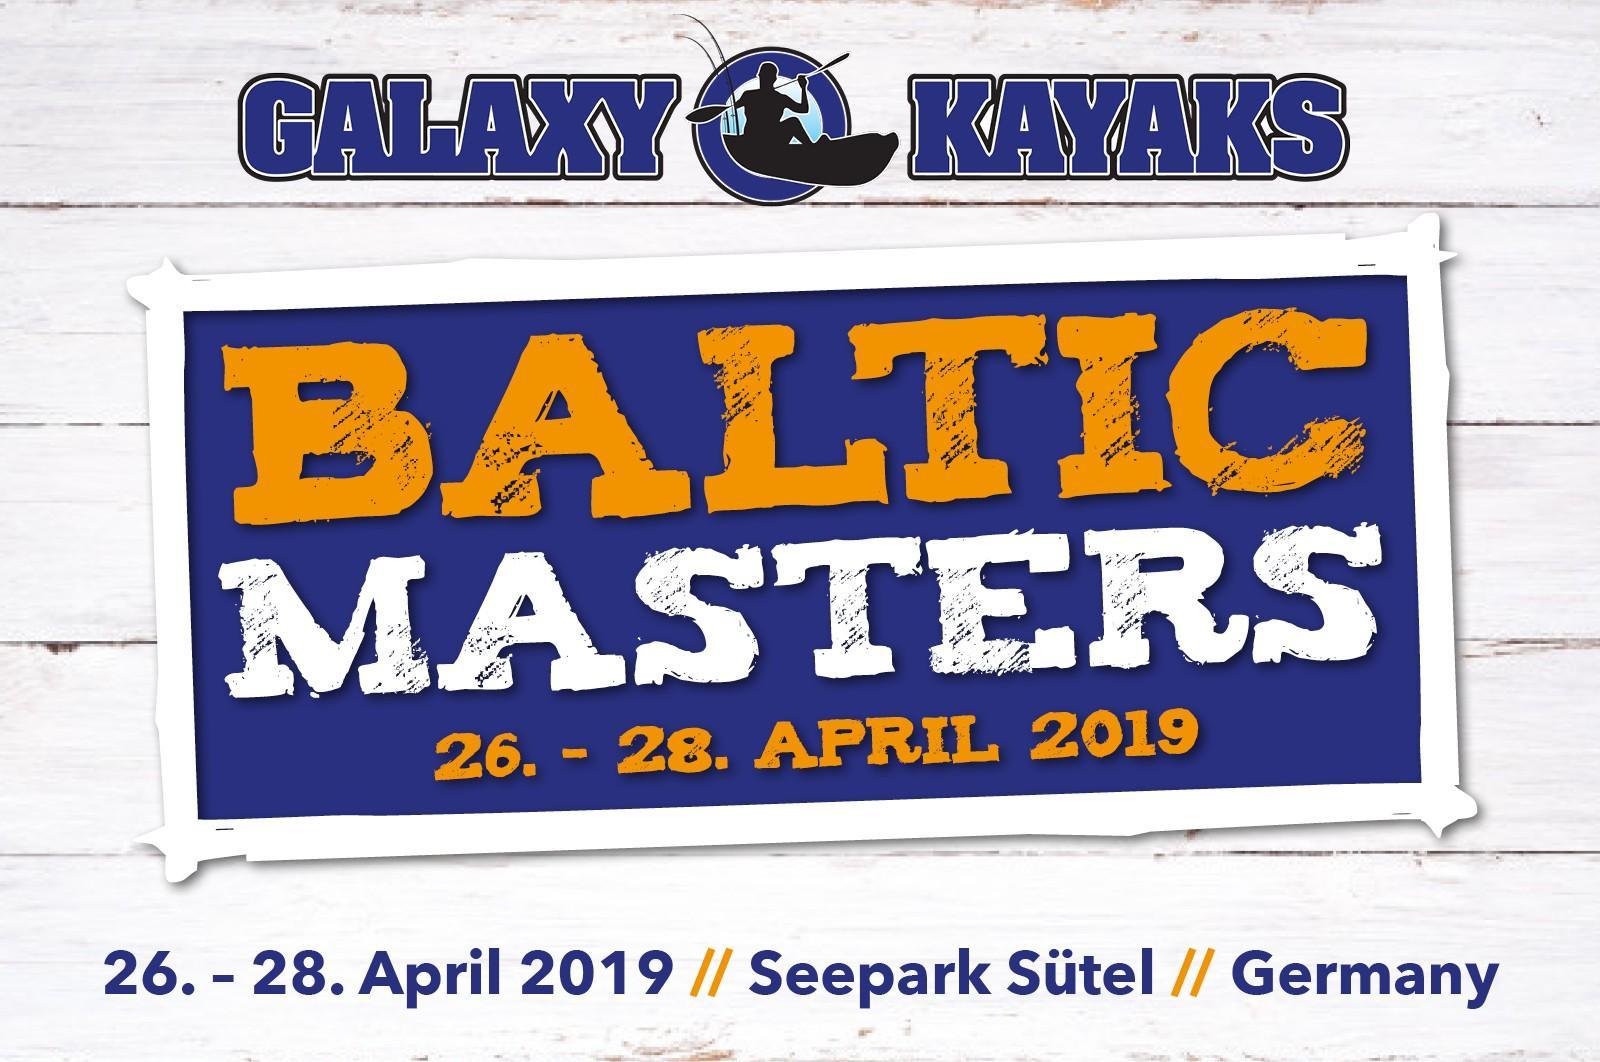 Baltic Masters 2019 - Passport